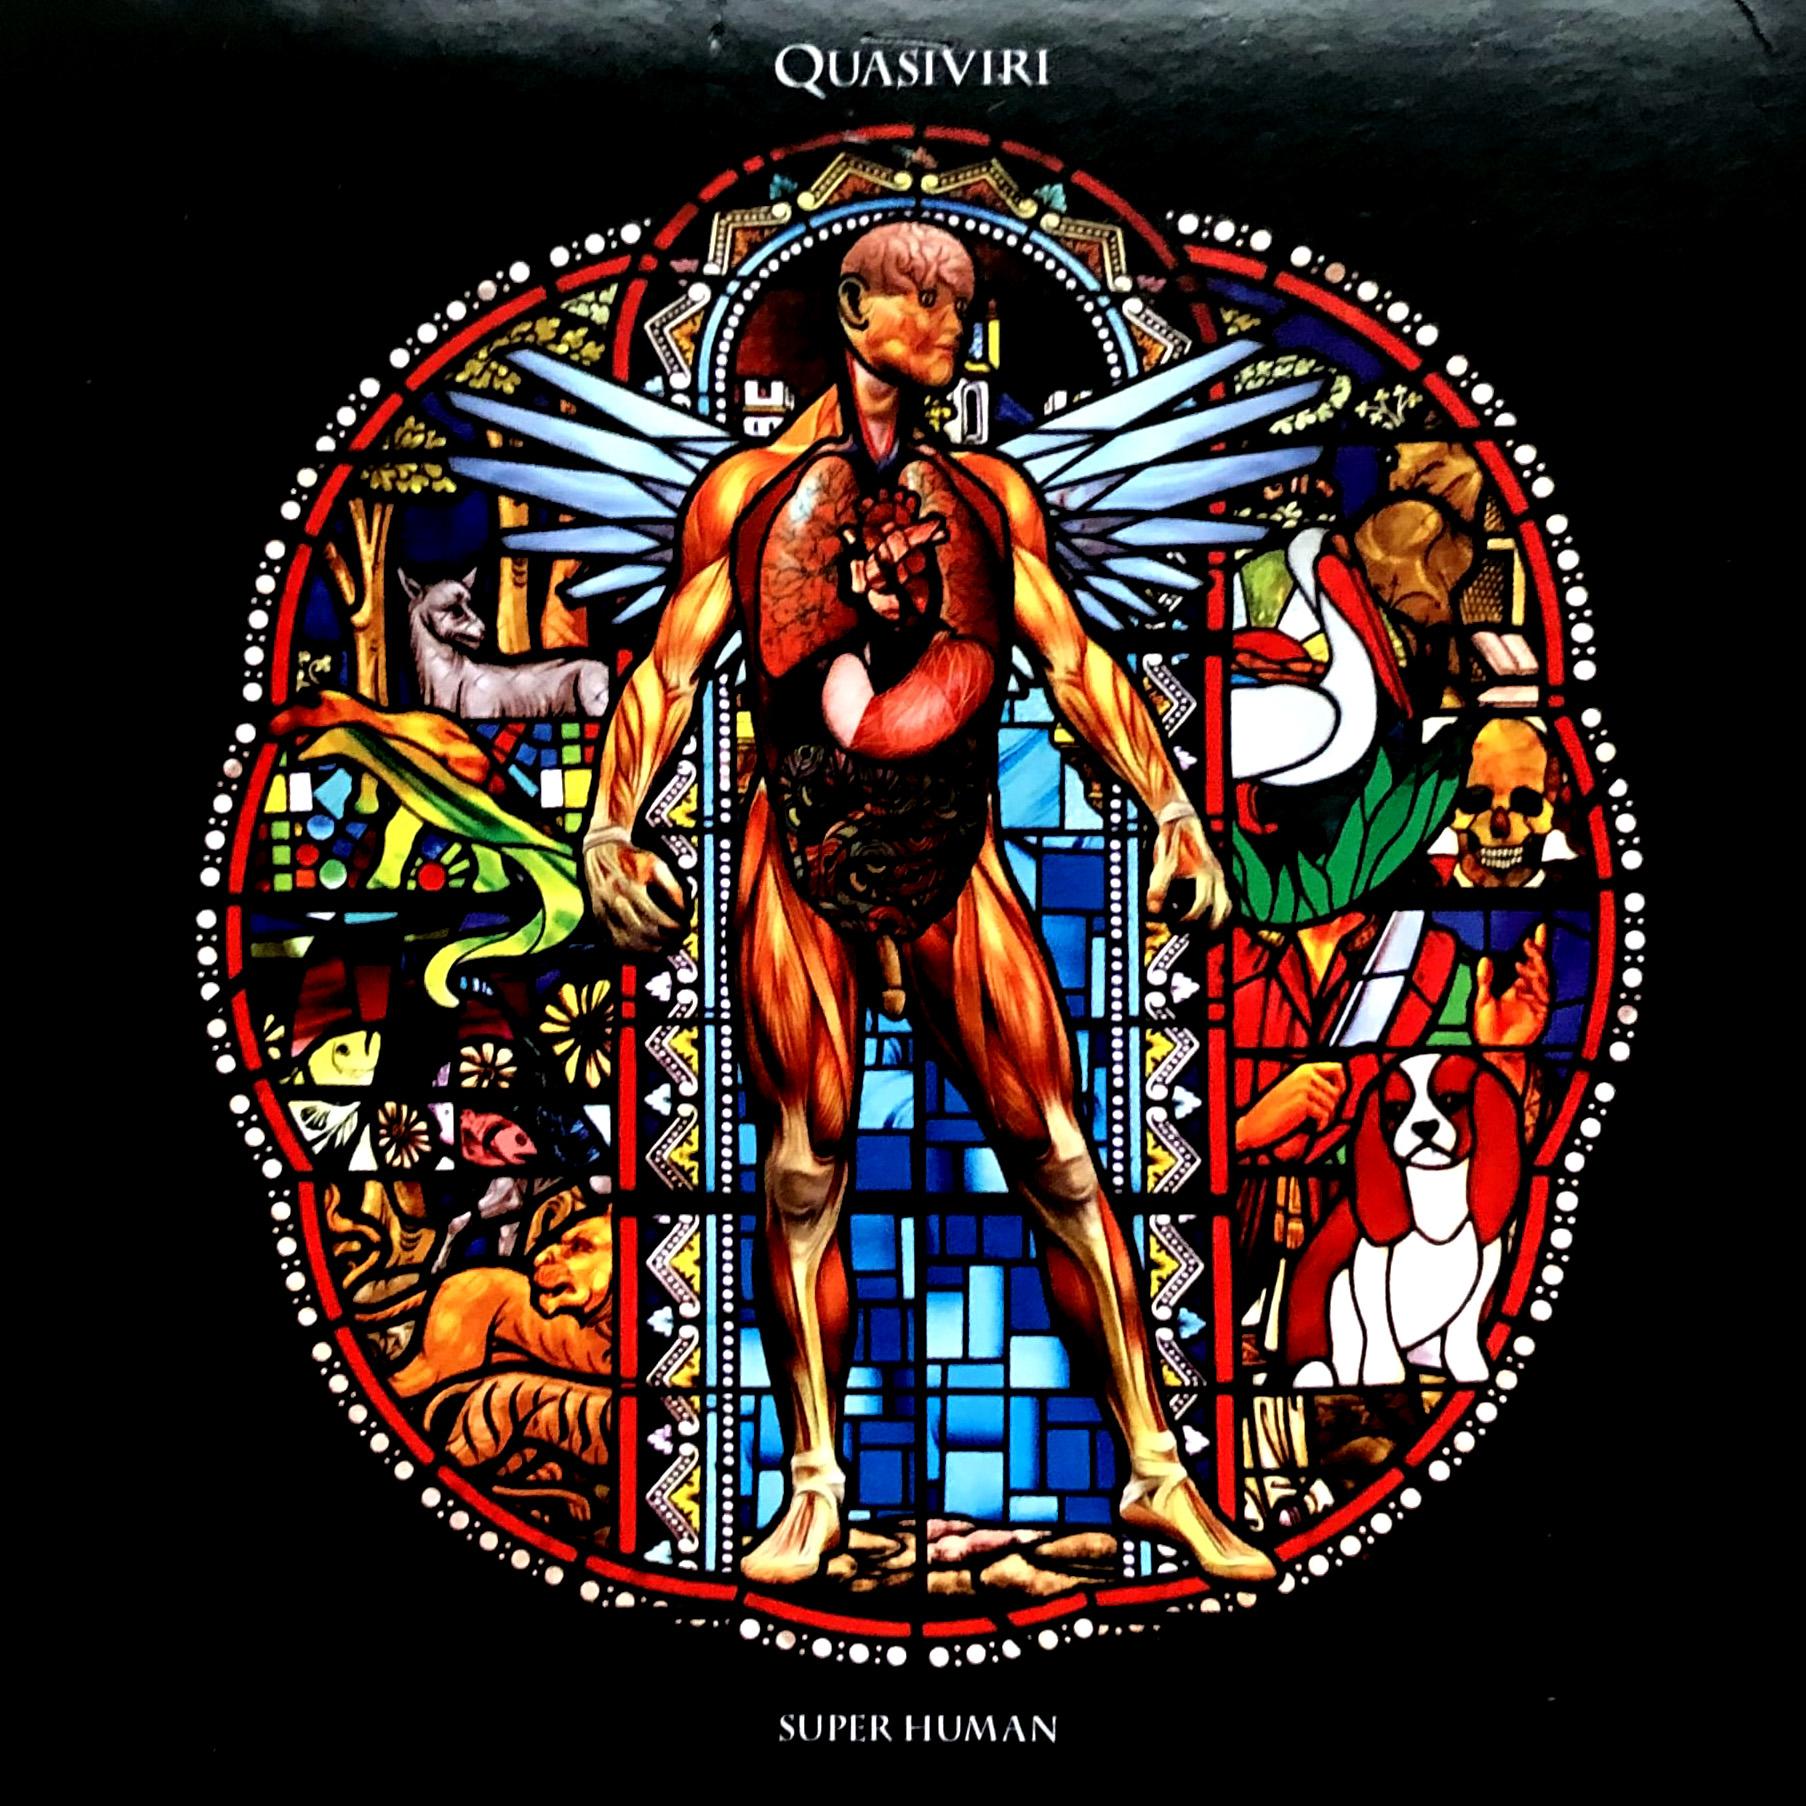 Quasiviri - Super Human CD